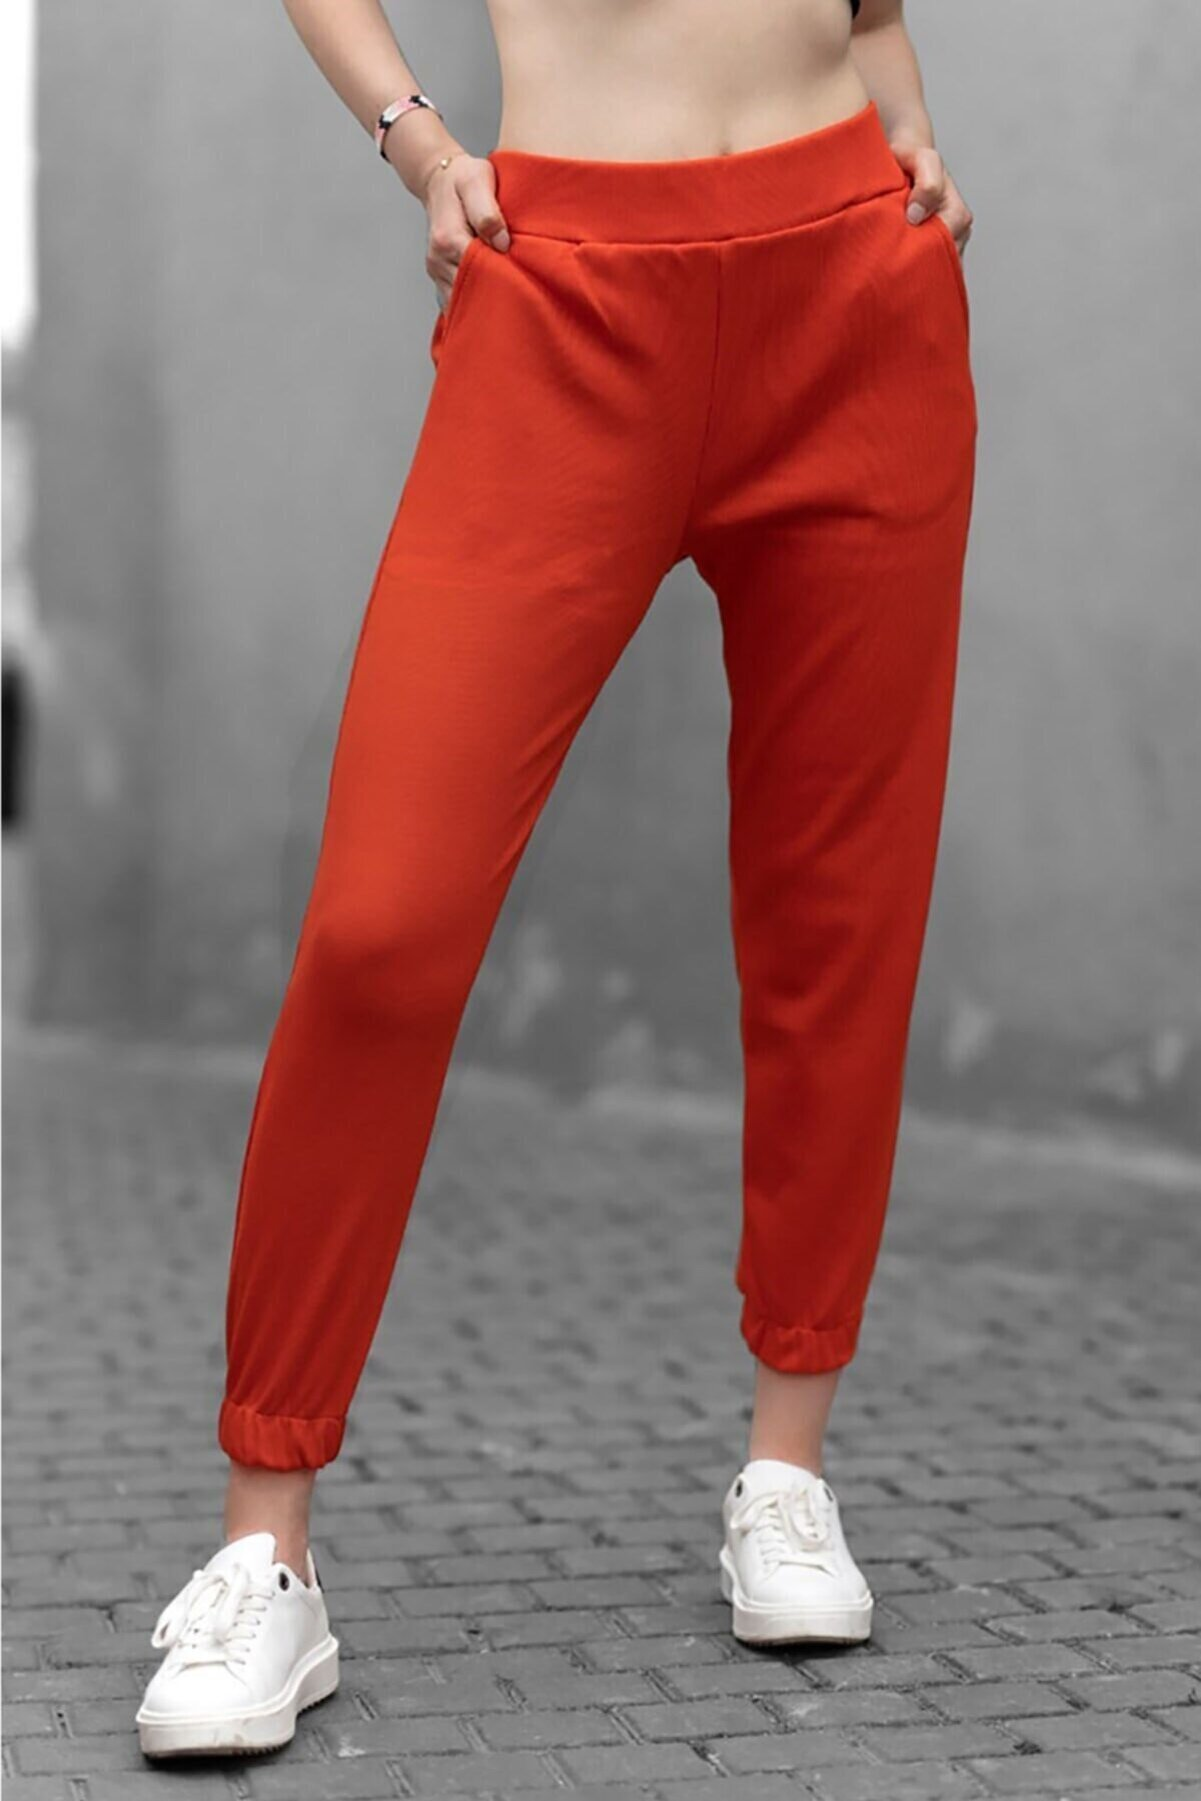 Madmext Kadın Turuncu Fitilli Basic Eşofman MG363